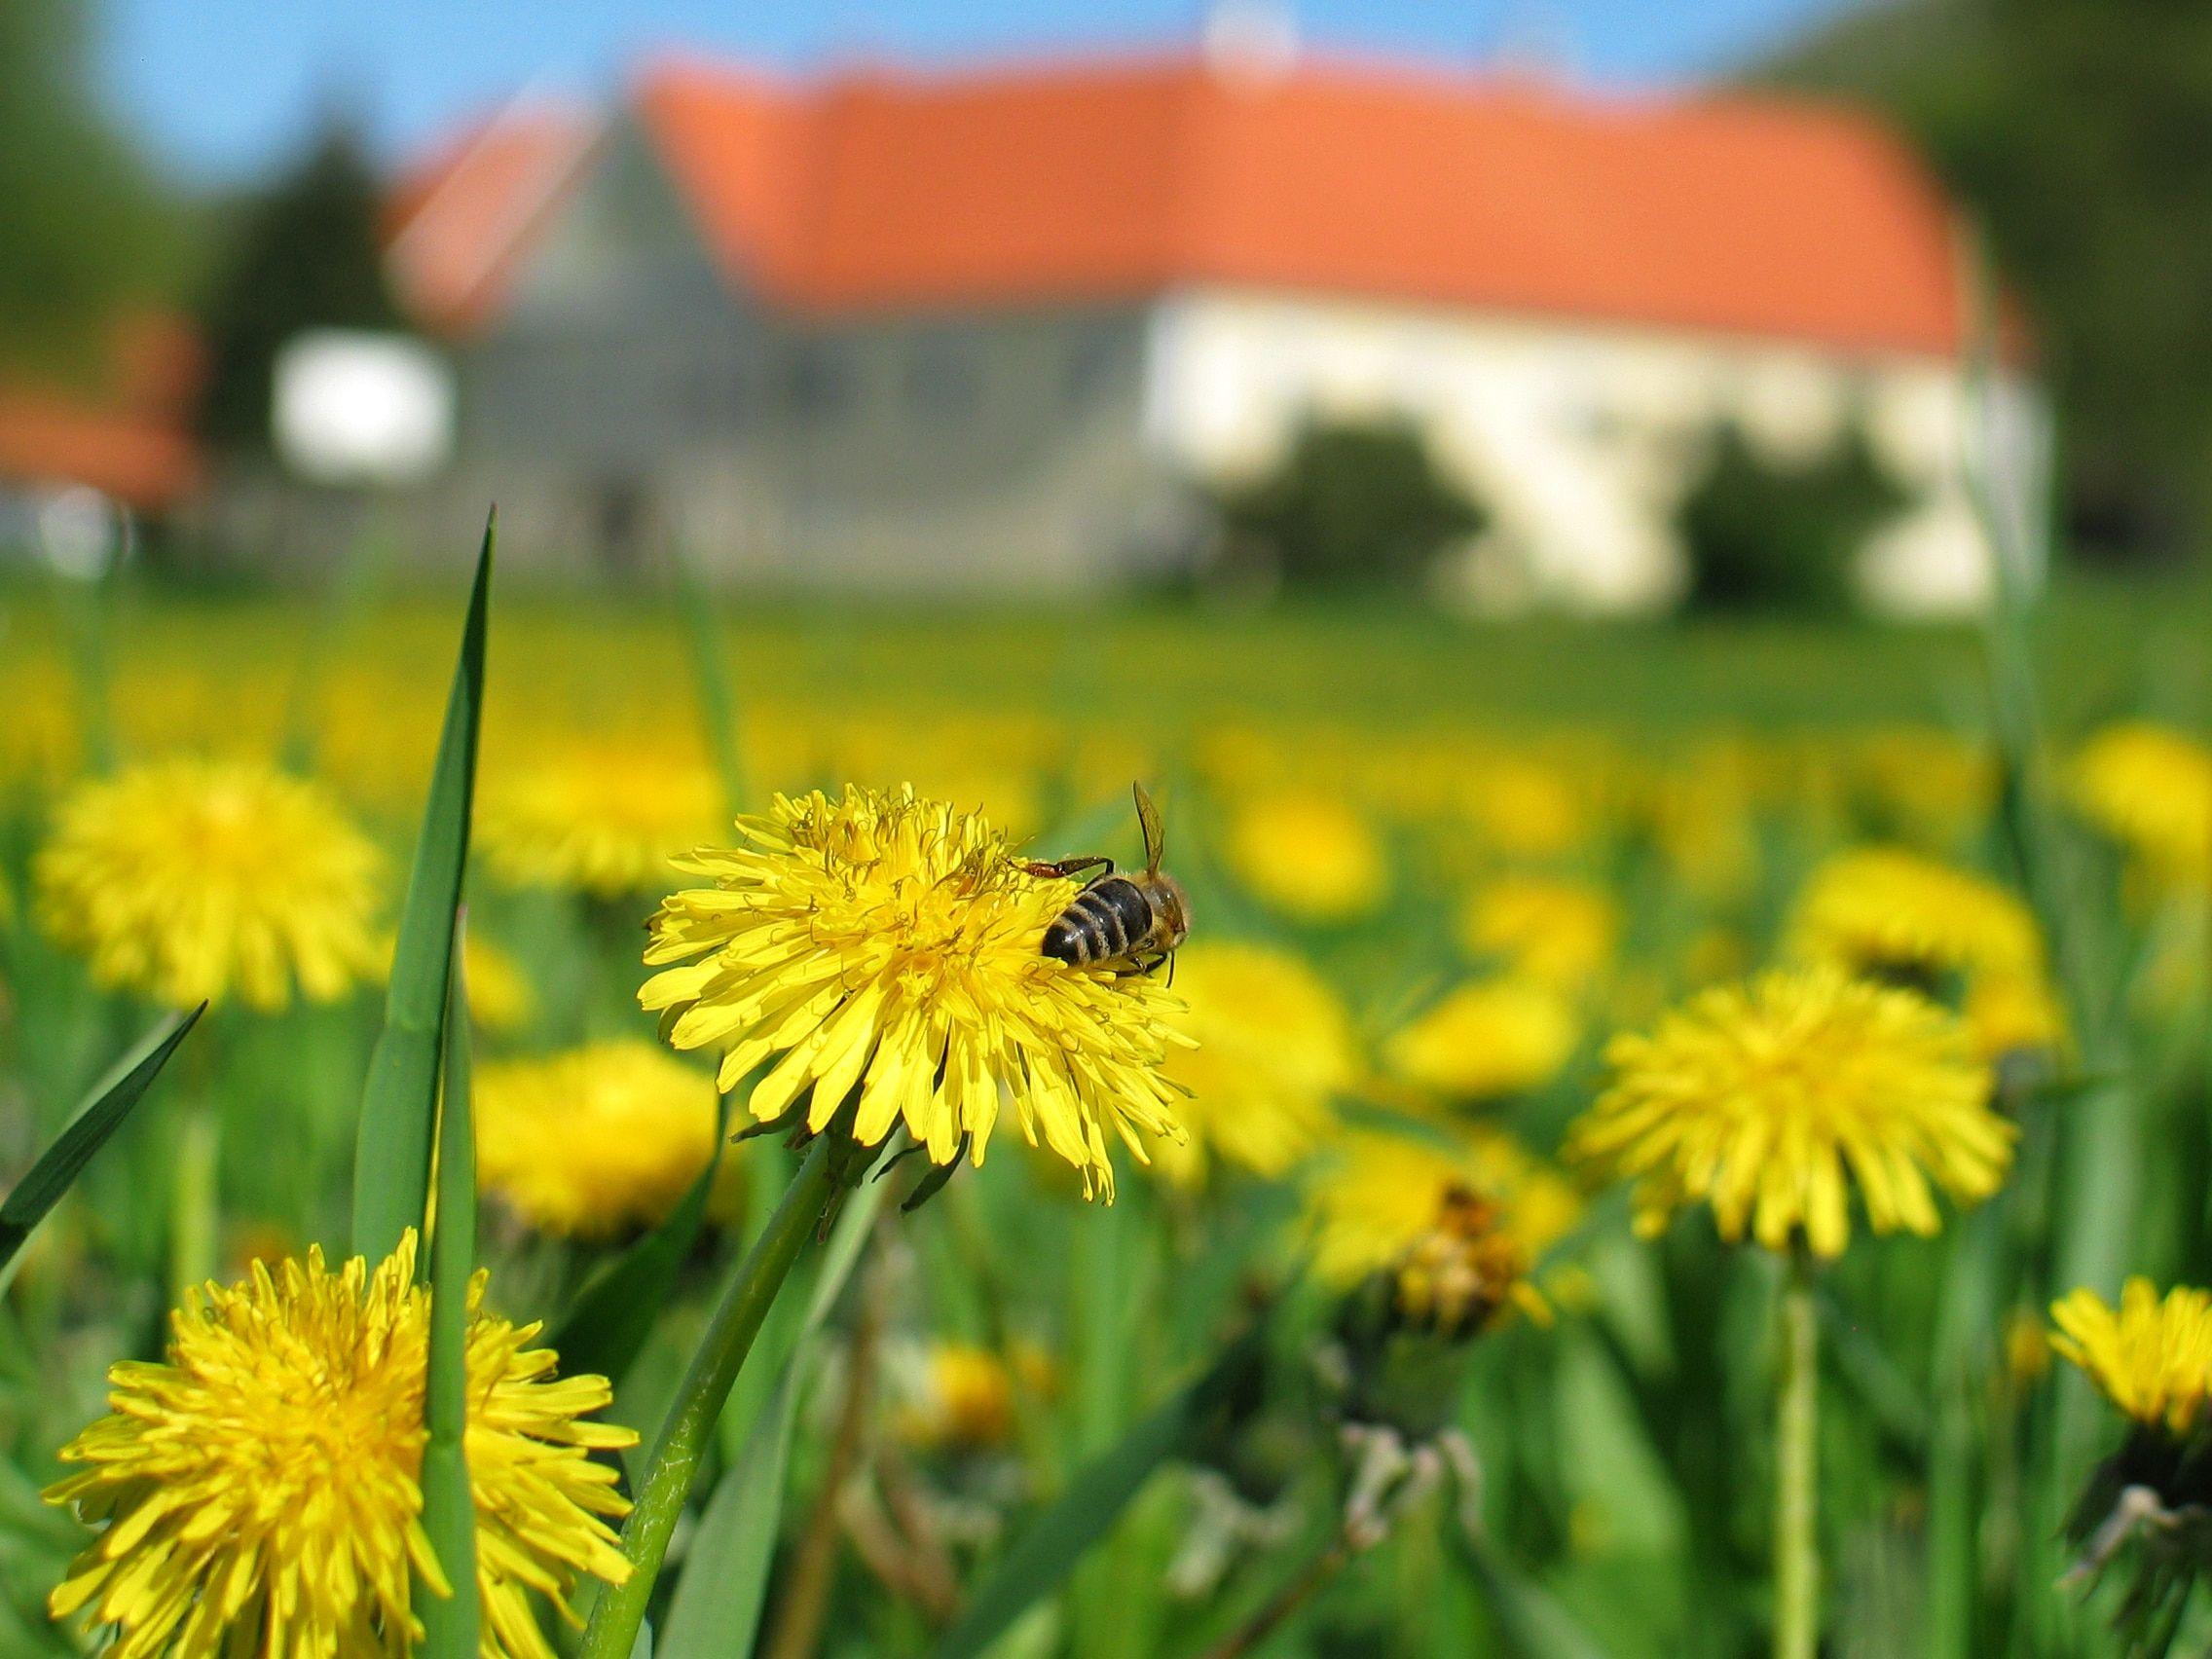 Maribor - Bees